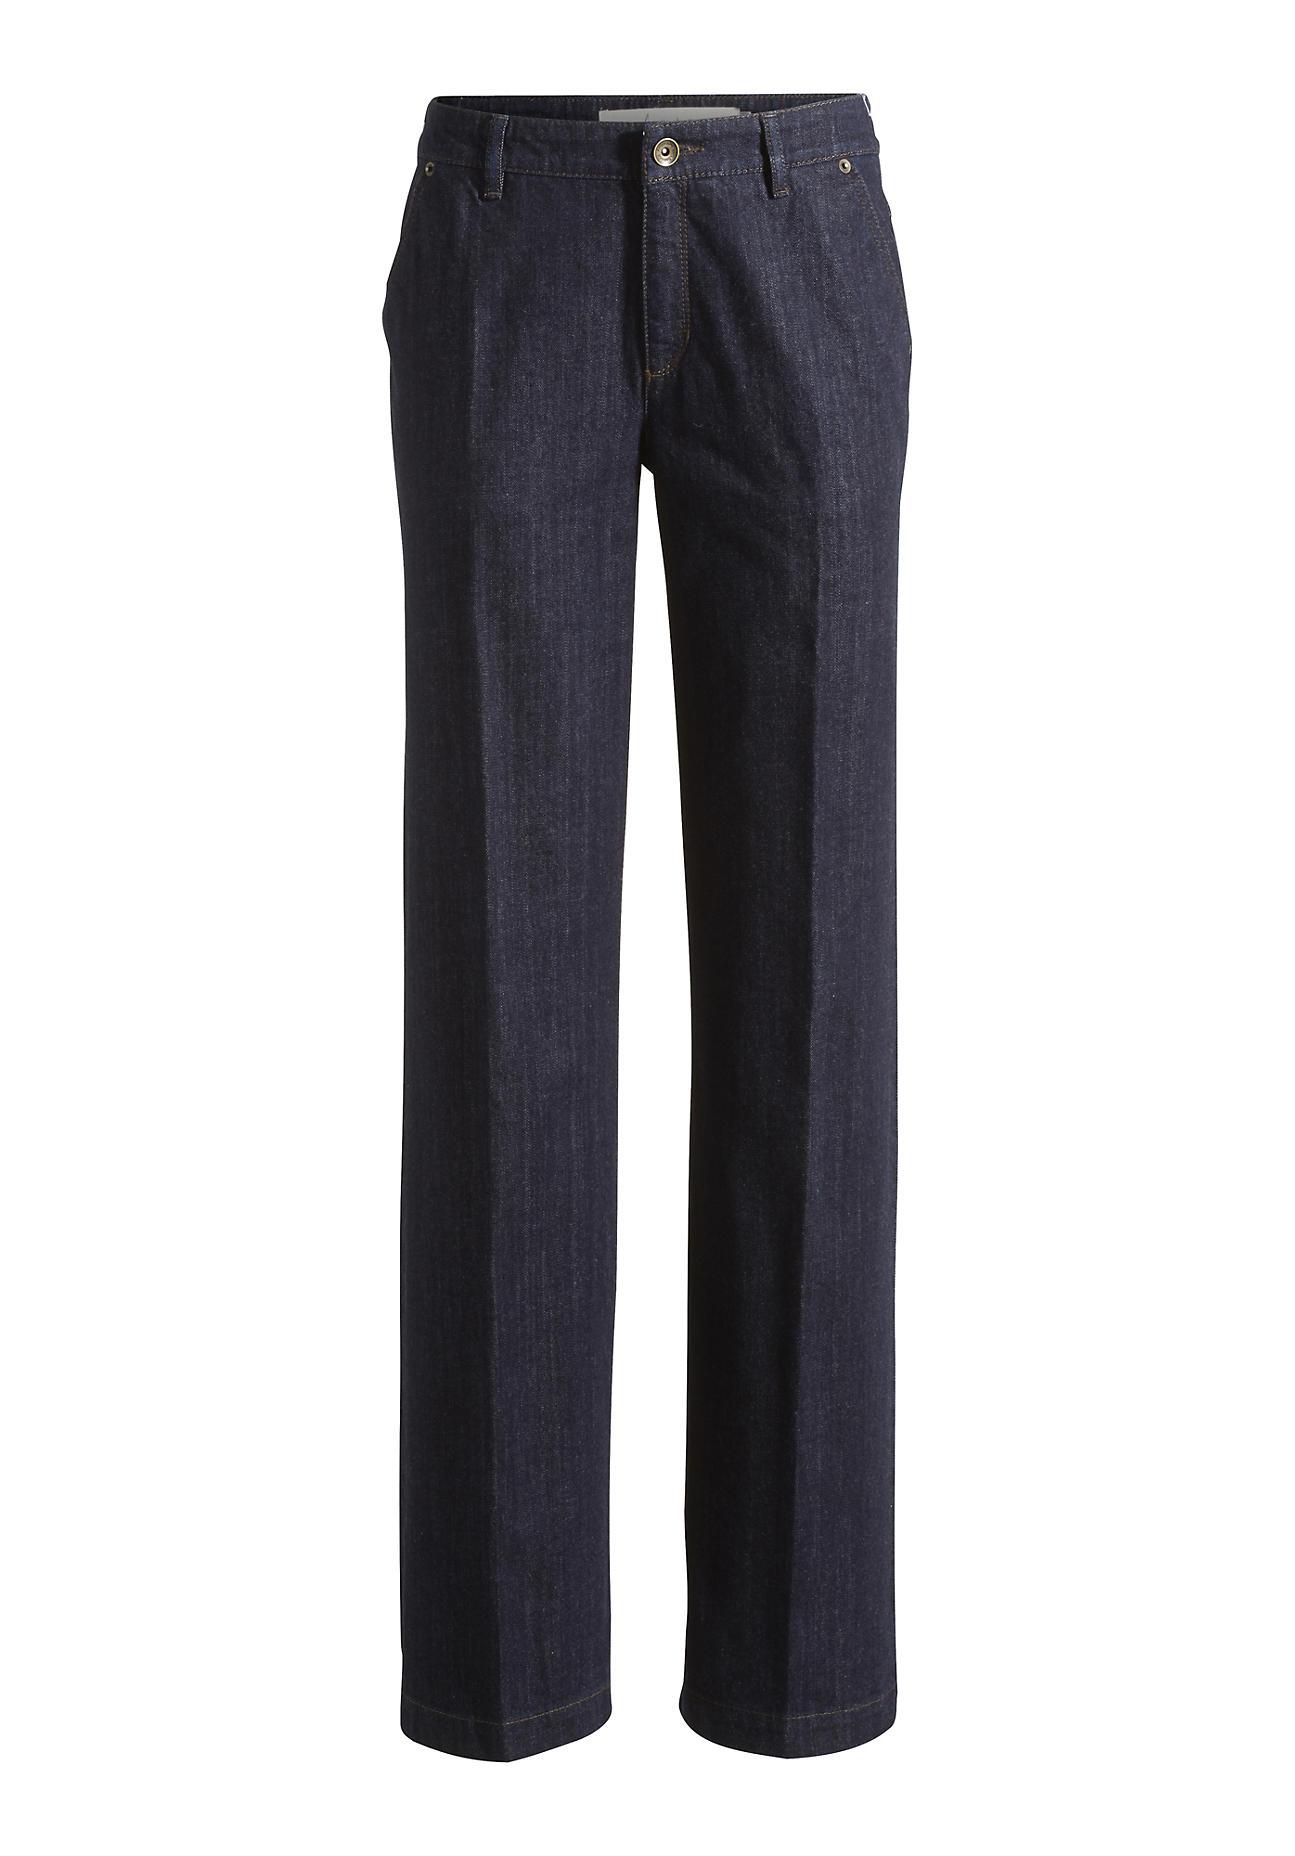 Hosen - hessnatur Damen Jeans Wide Leg aus Bio Baumwolle – blau –  - Onlineshop Hessnatur